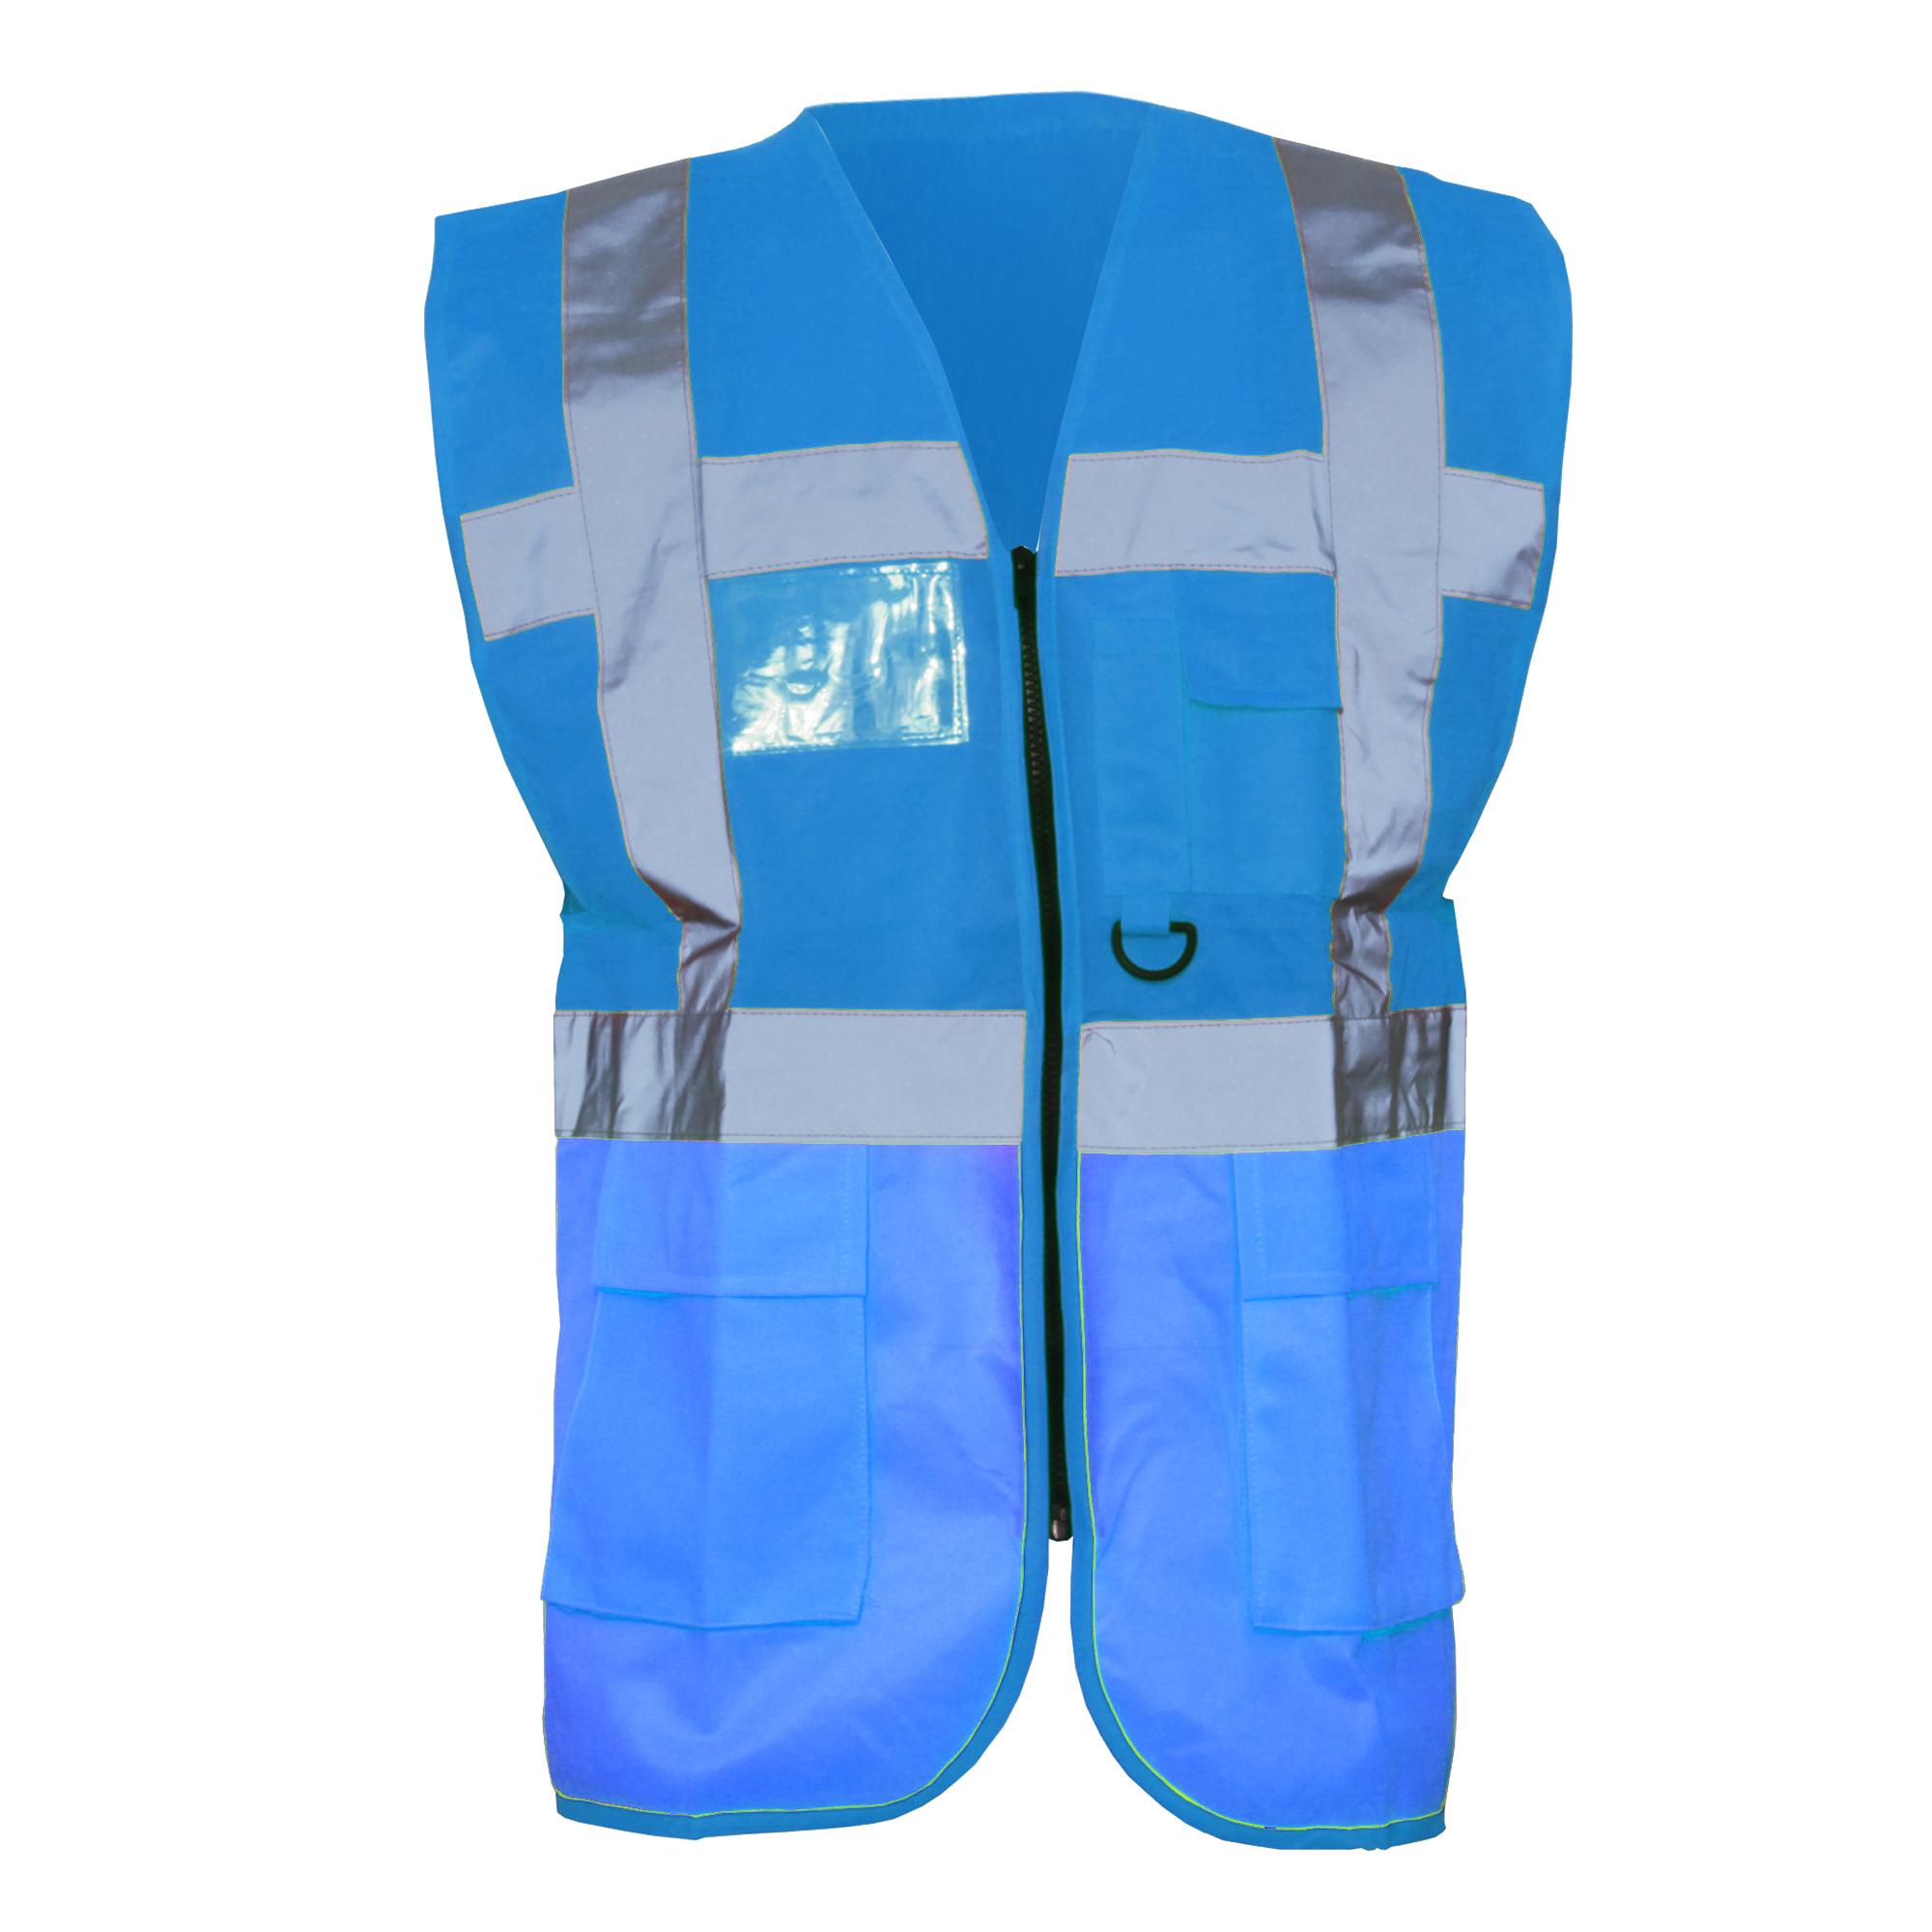 Yoko Hi-Vis Premium Executive//Manager Waistcoat Jacket BC4416 Pack of 2